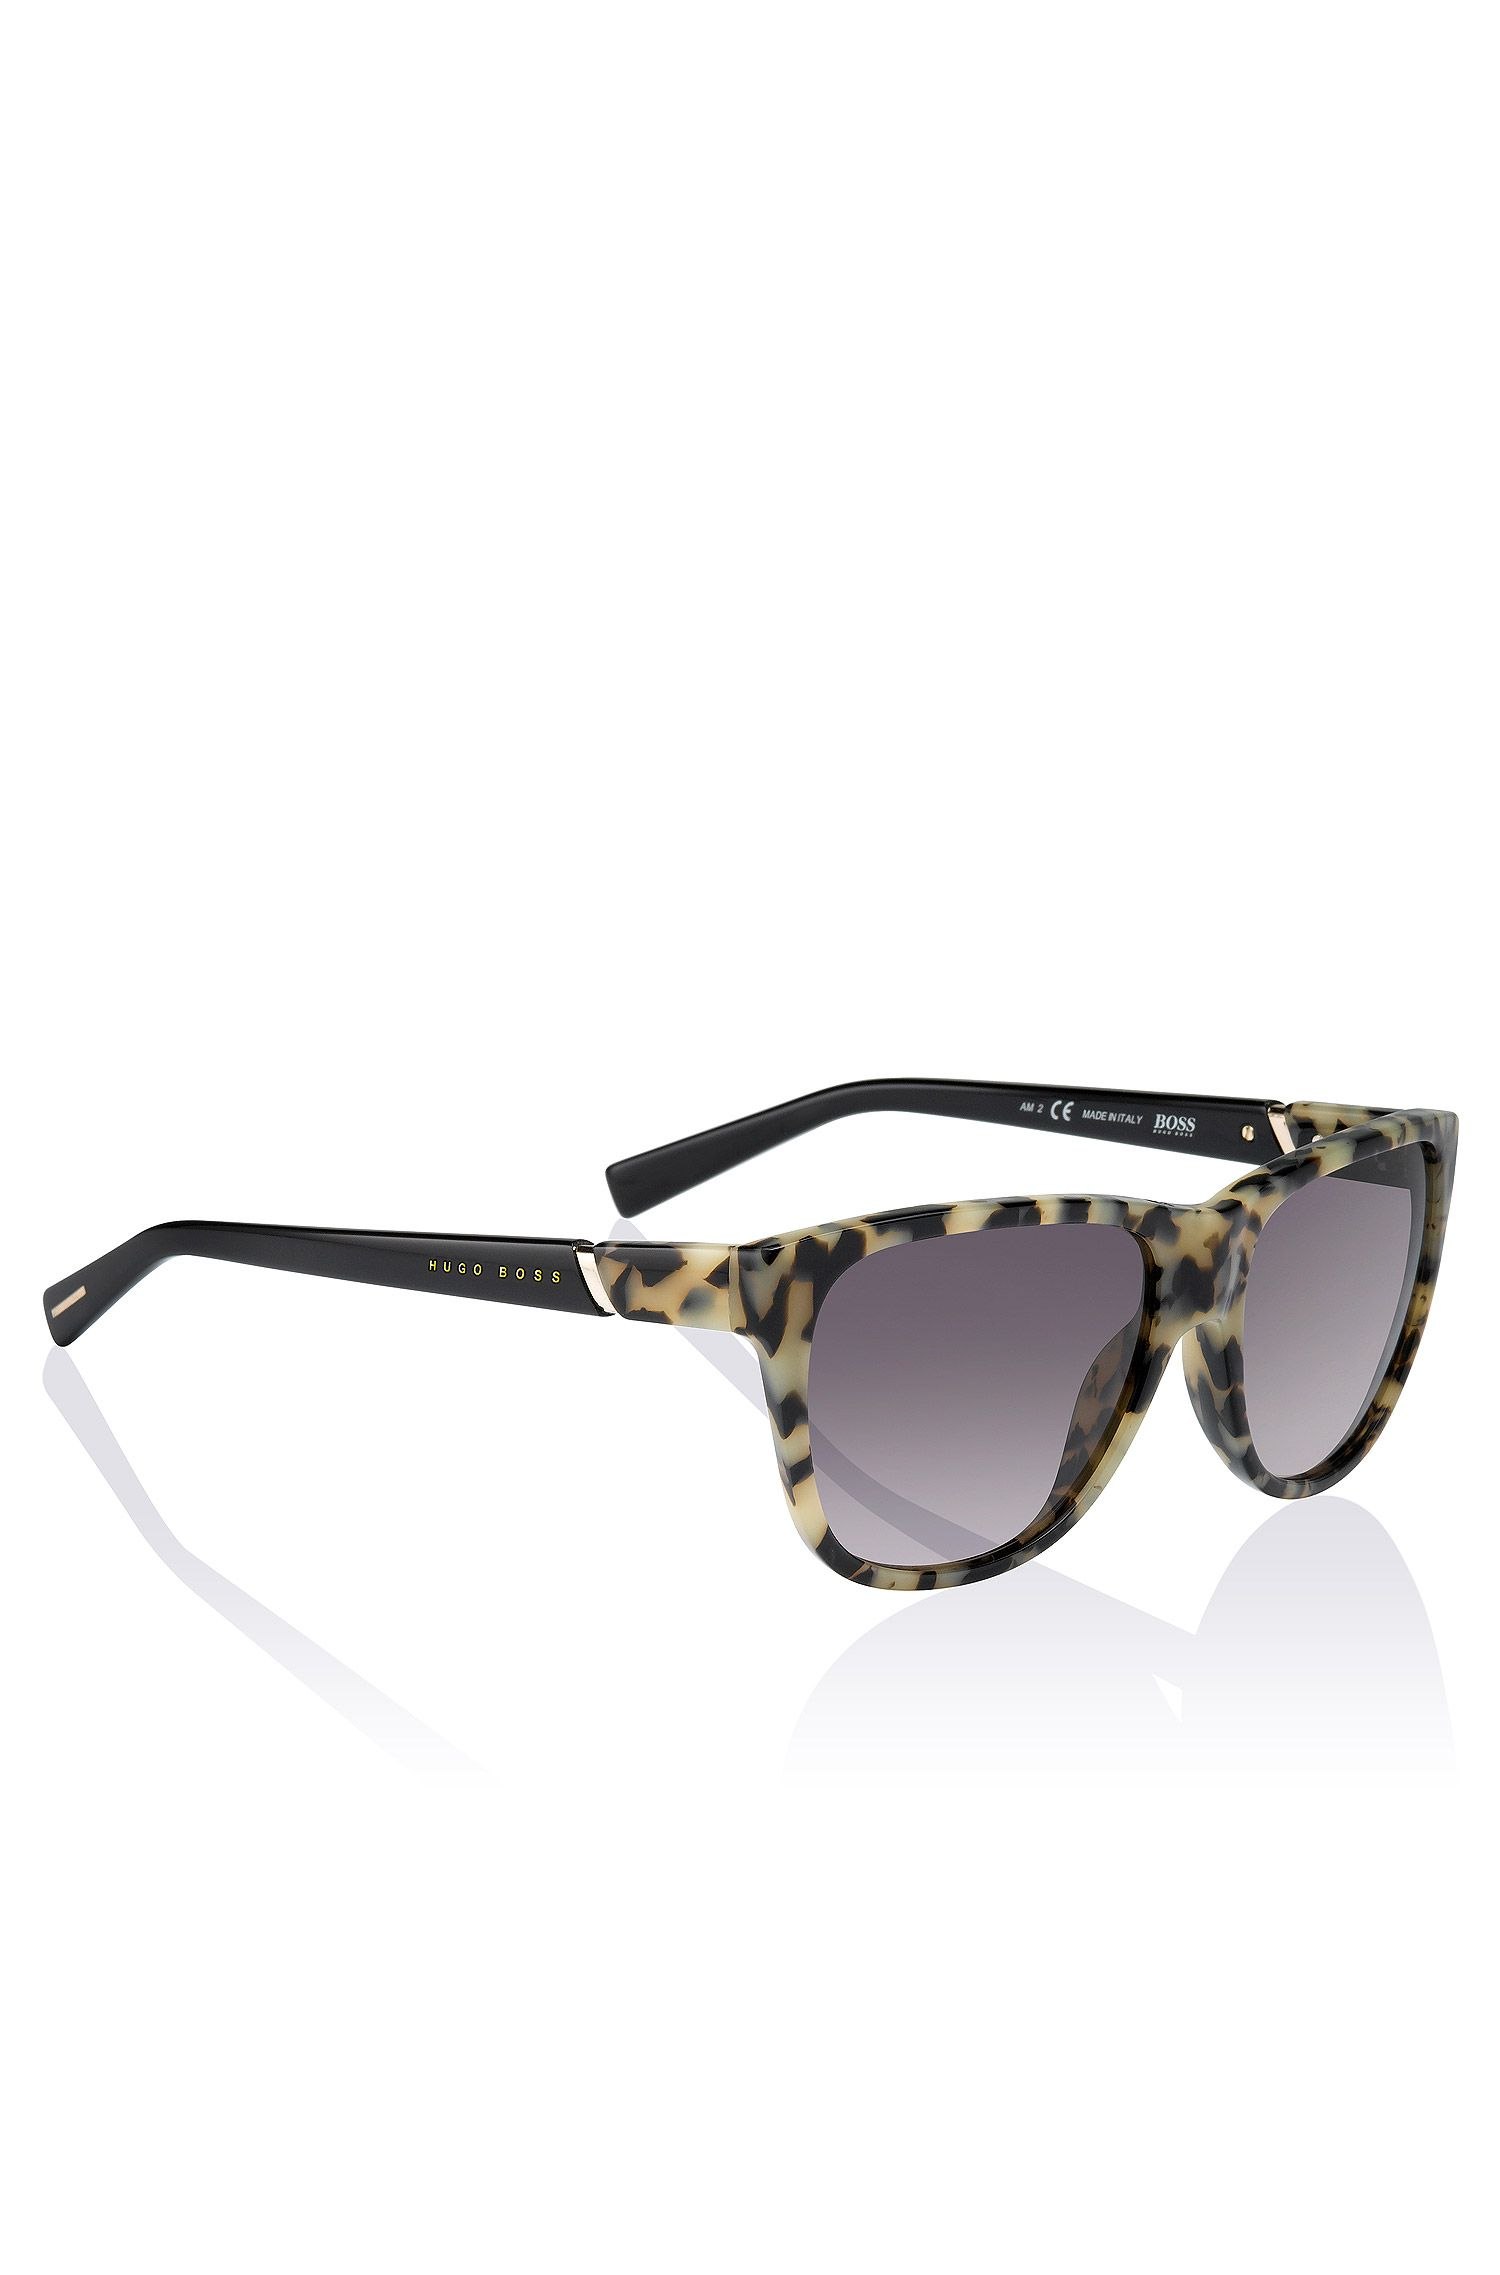 Sonnenbrille ´BOSS 0526/S` mit Golddetails